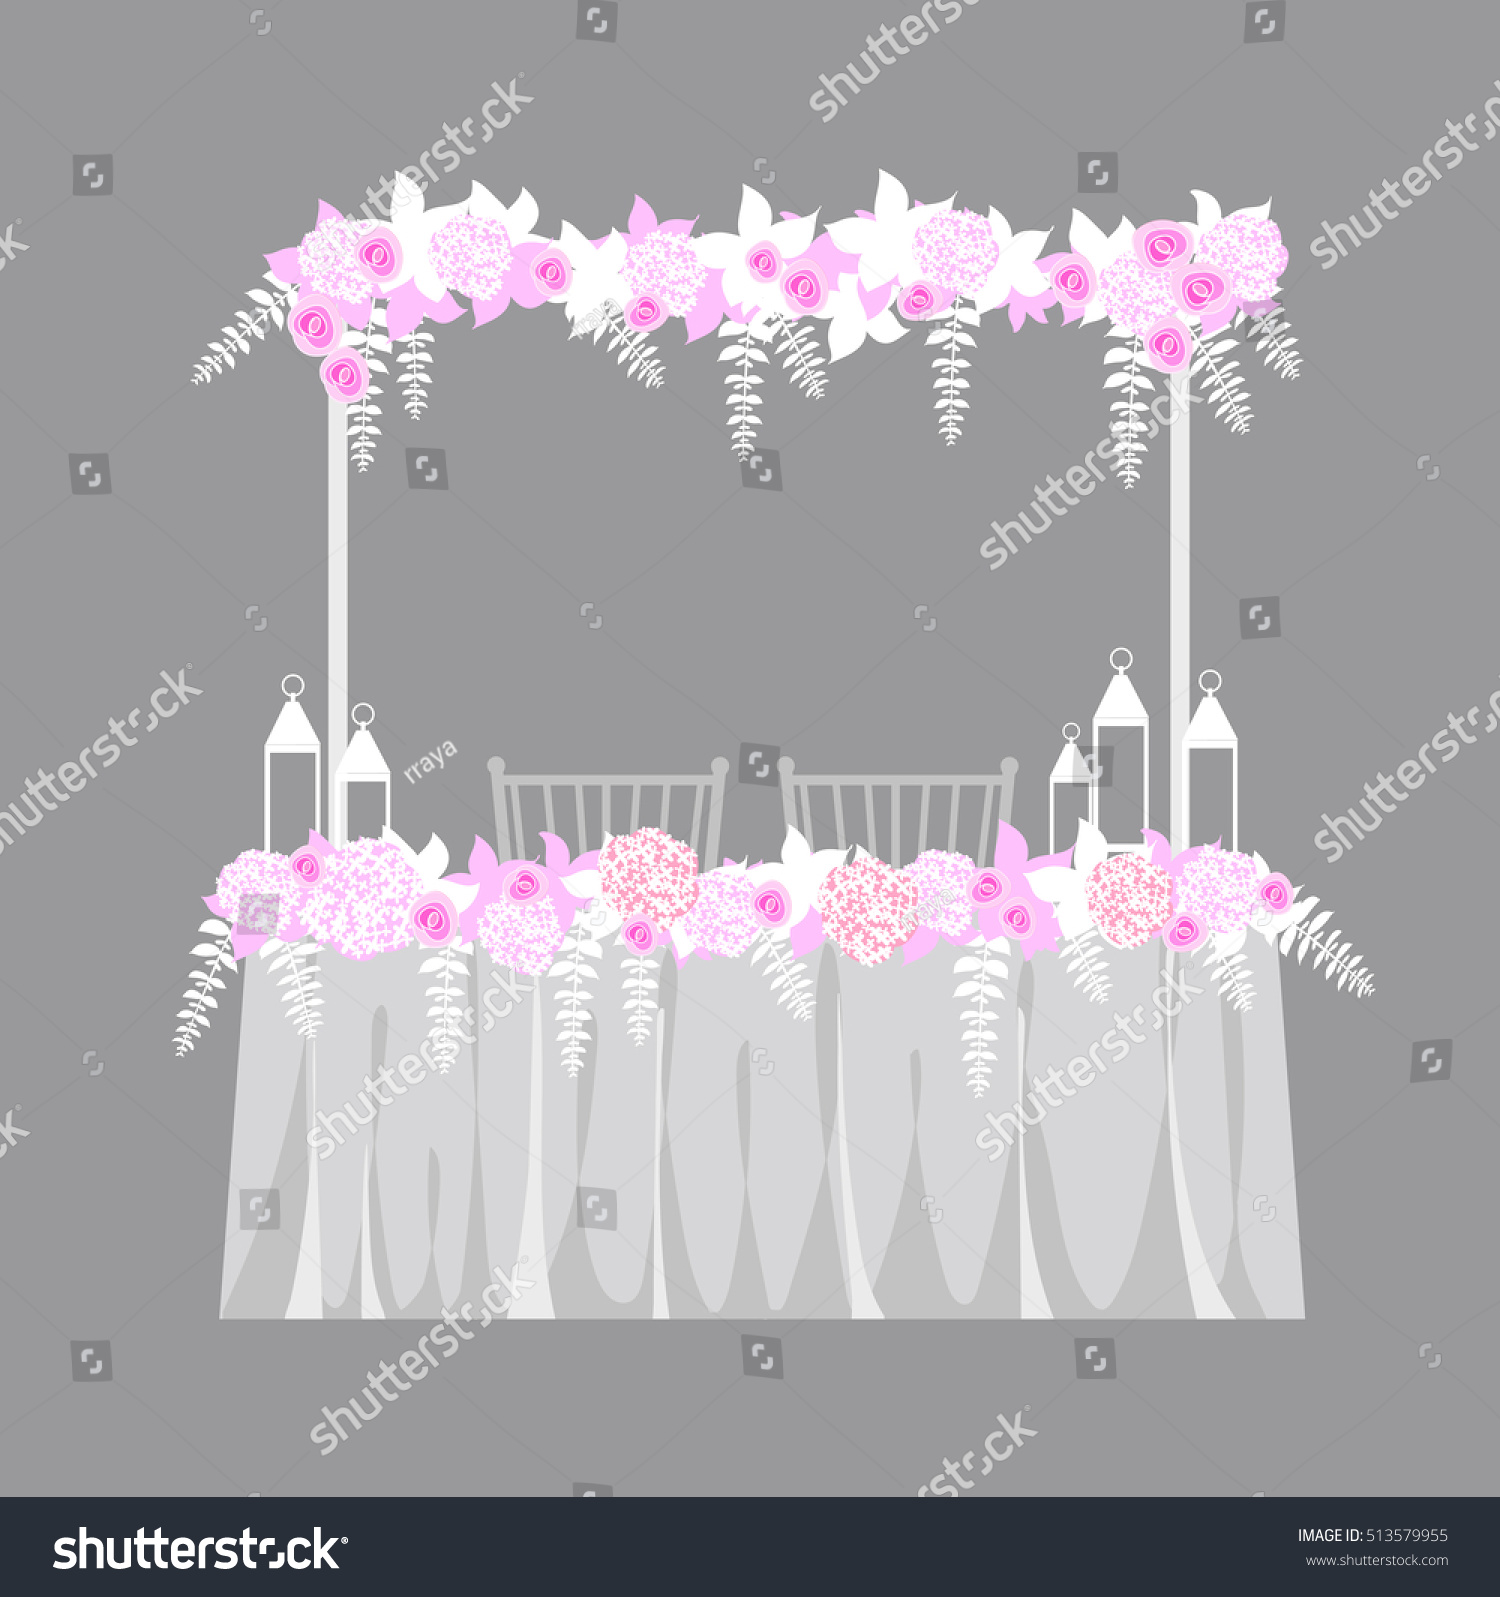 Bride Groom Table Decoration Wedding Table Decoration Table Bride Groom Stock Vector 513579955